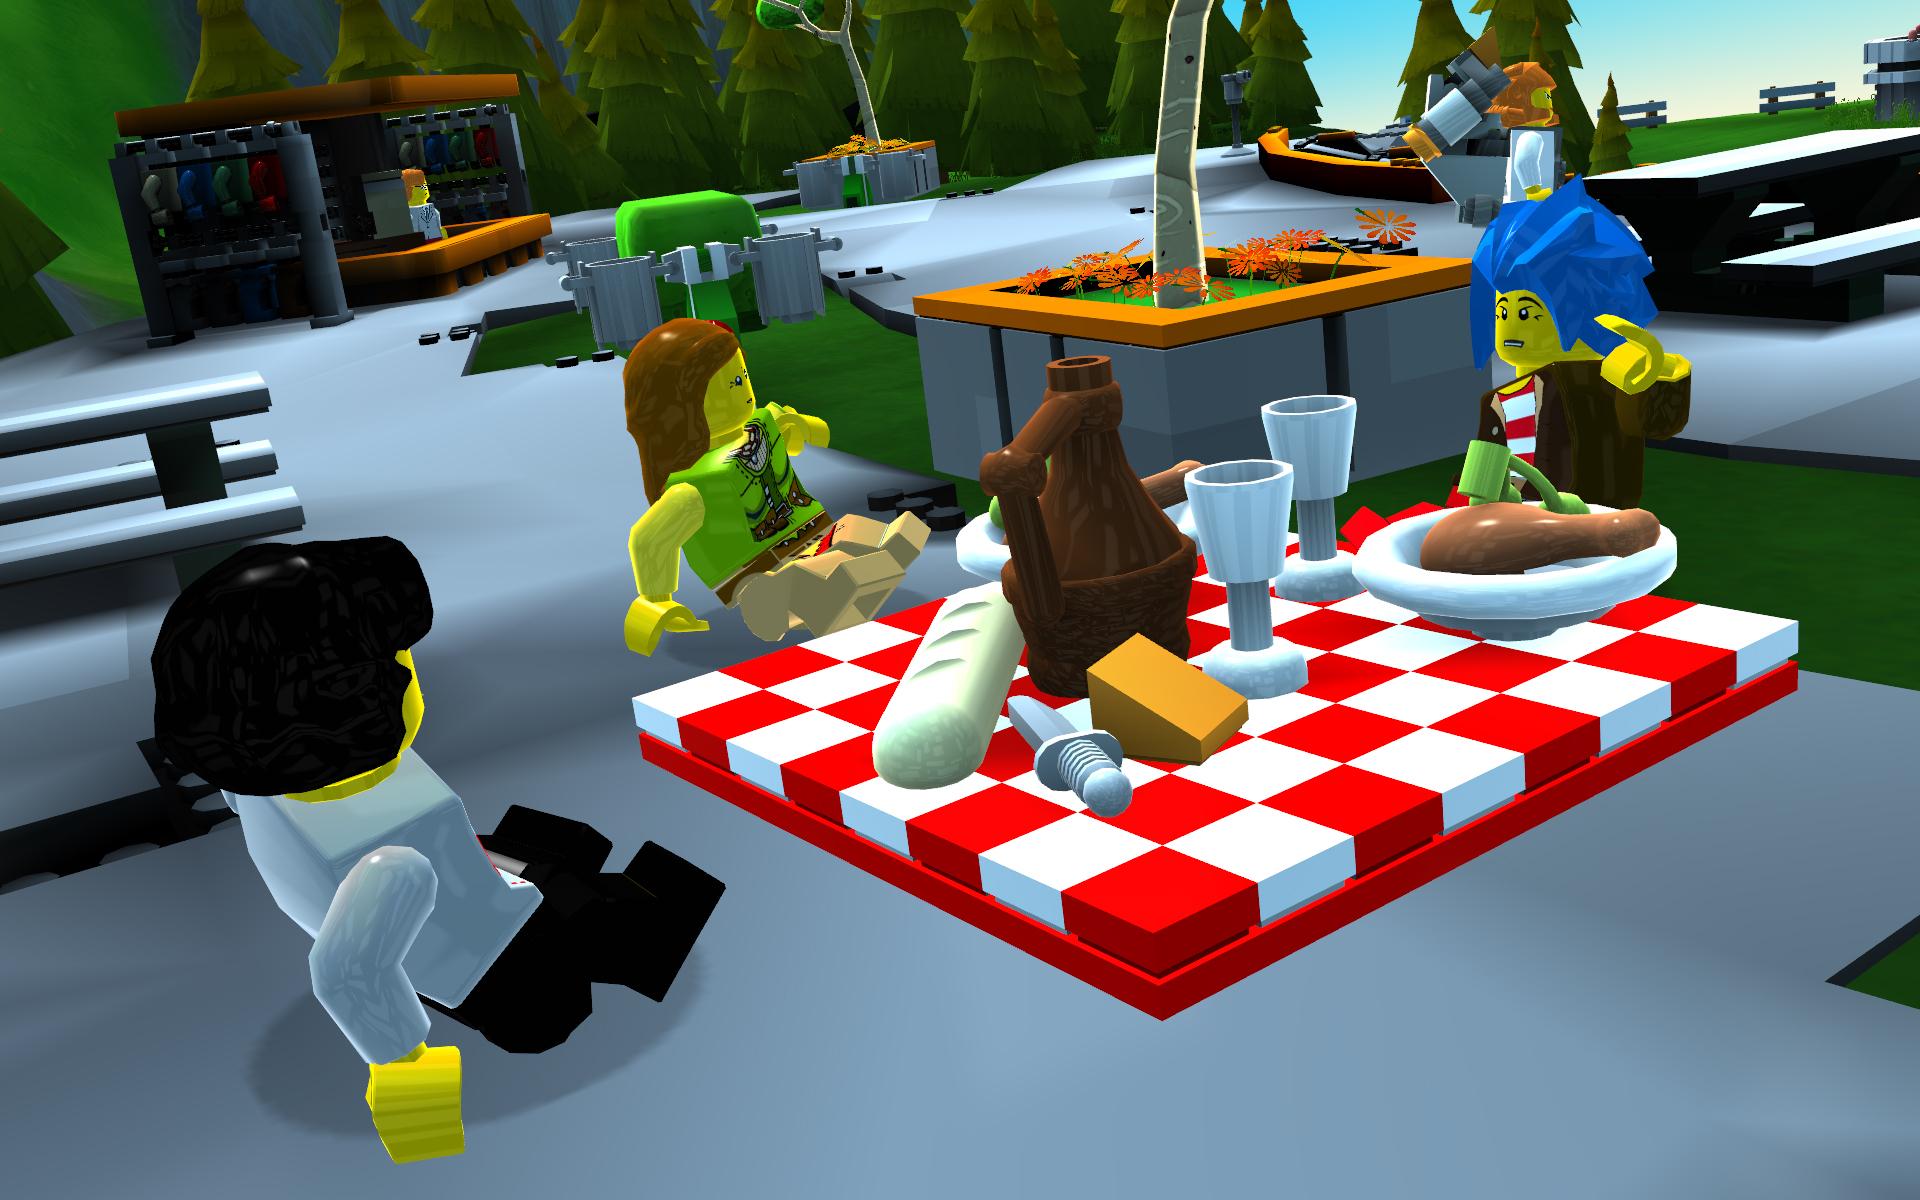 Lego Universe: The Lego MMOG